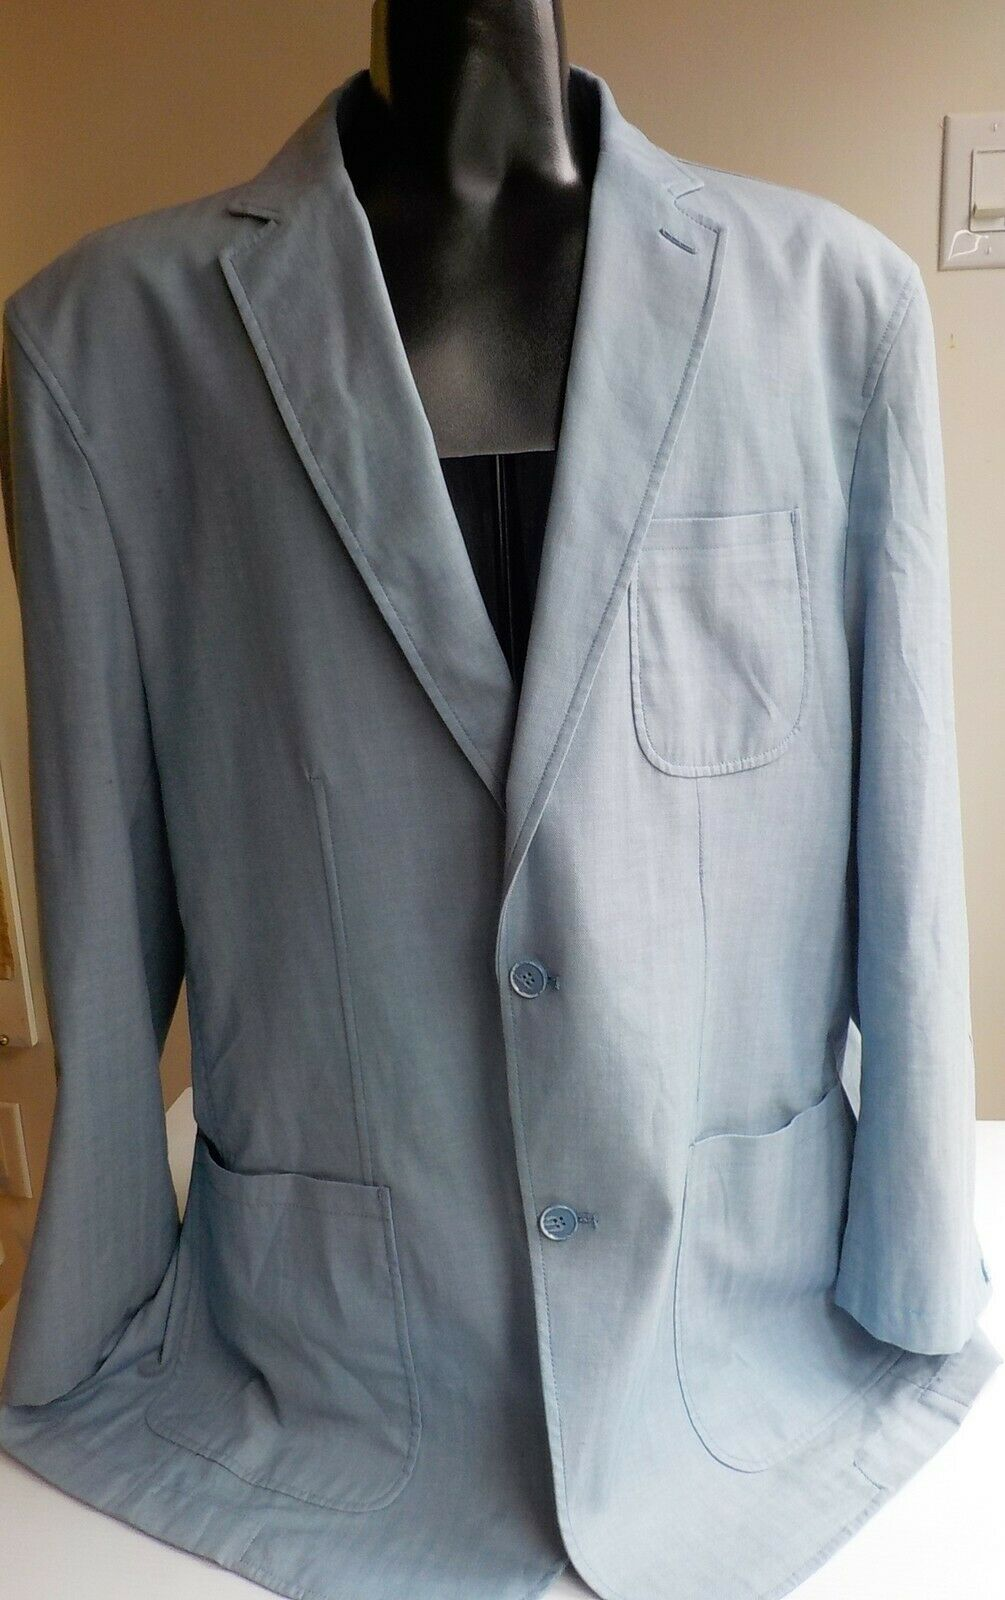 ENZO TOVARE Lightweight 100% baumwolle Lt. Blau Two-Button Dual Vent Sport Coat 50L